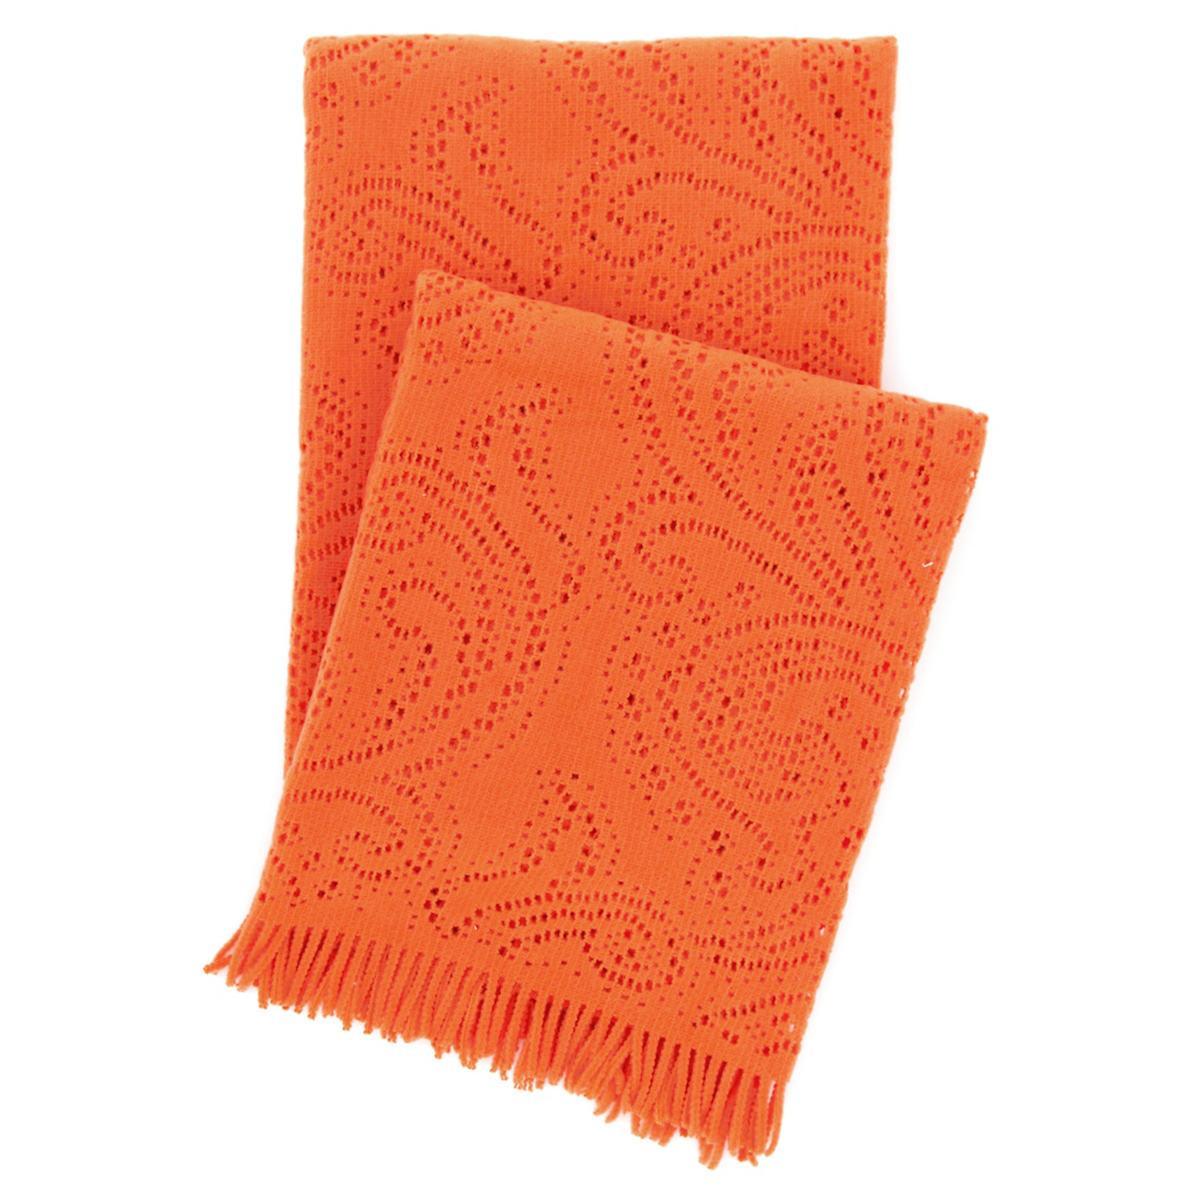 Paisley Lace Orange Throw